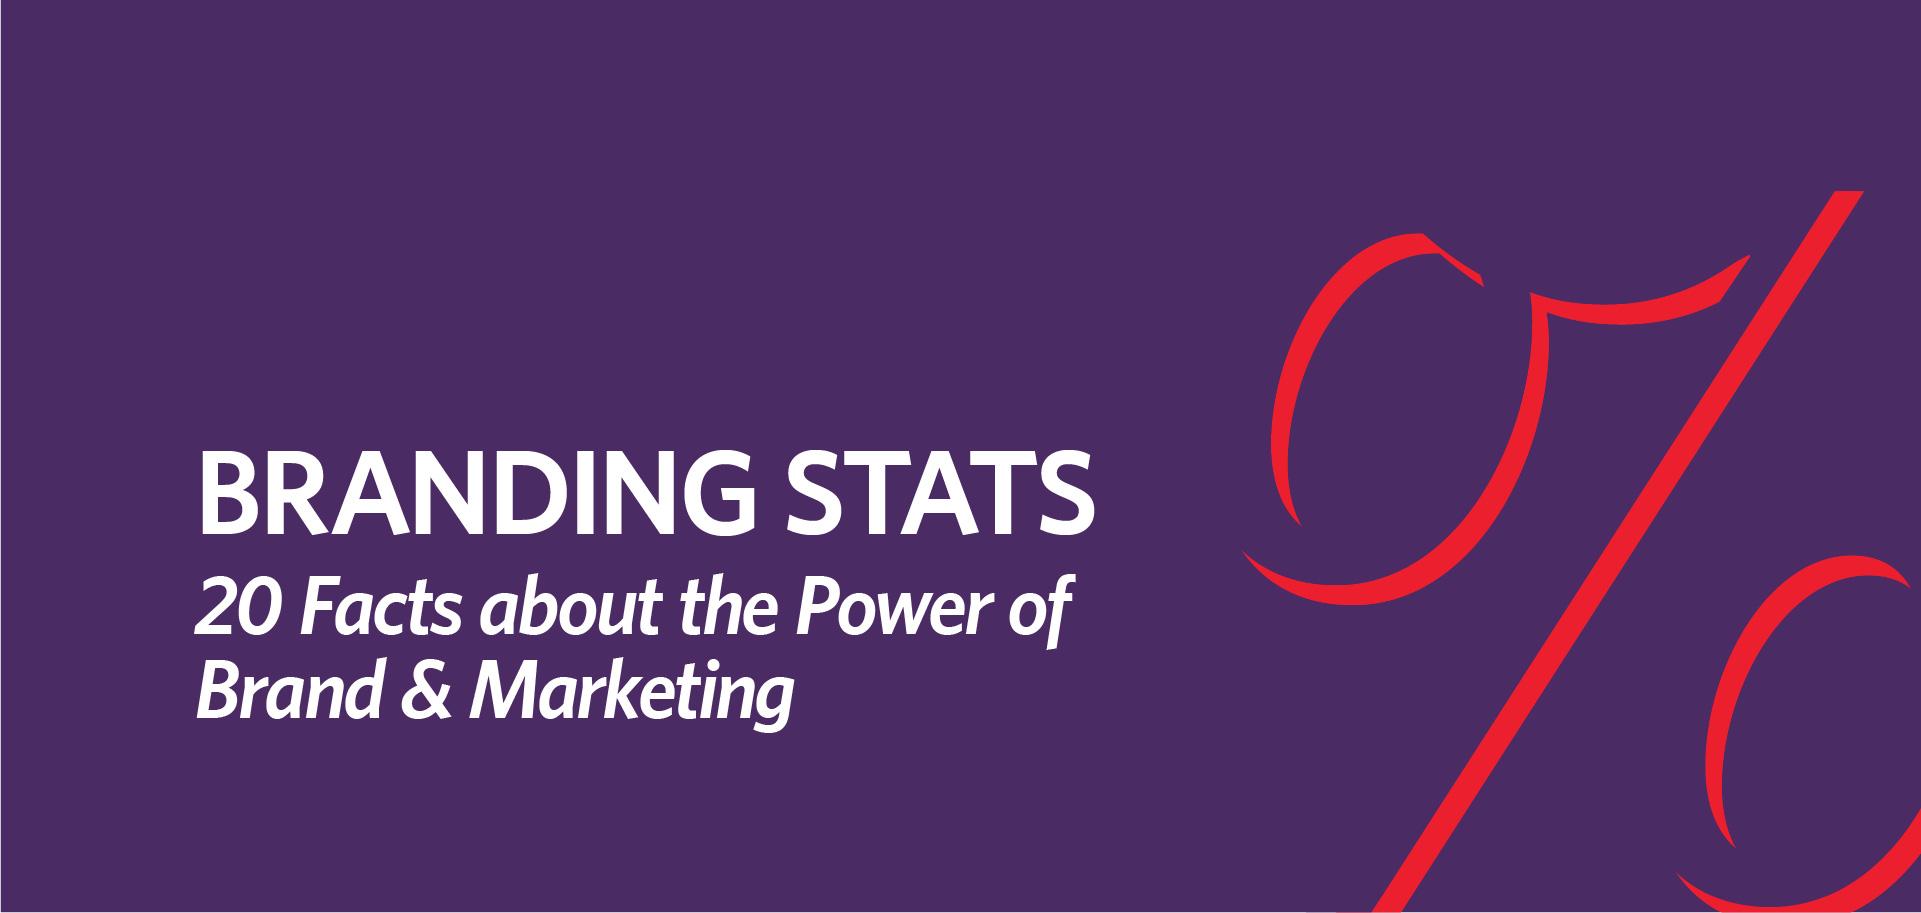 Branding Stats Marketing Facts power of brand Kettle Fire Creative blog branding Branding Stats: 20 Facts about the Power of Brand & Marketing branding quotes fi